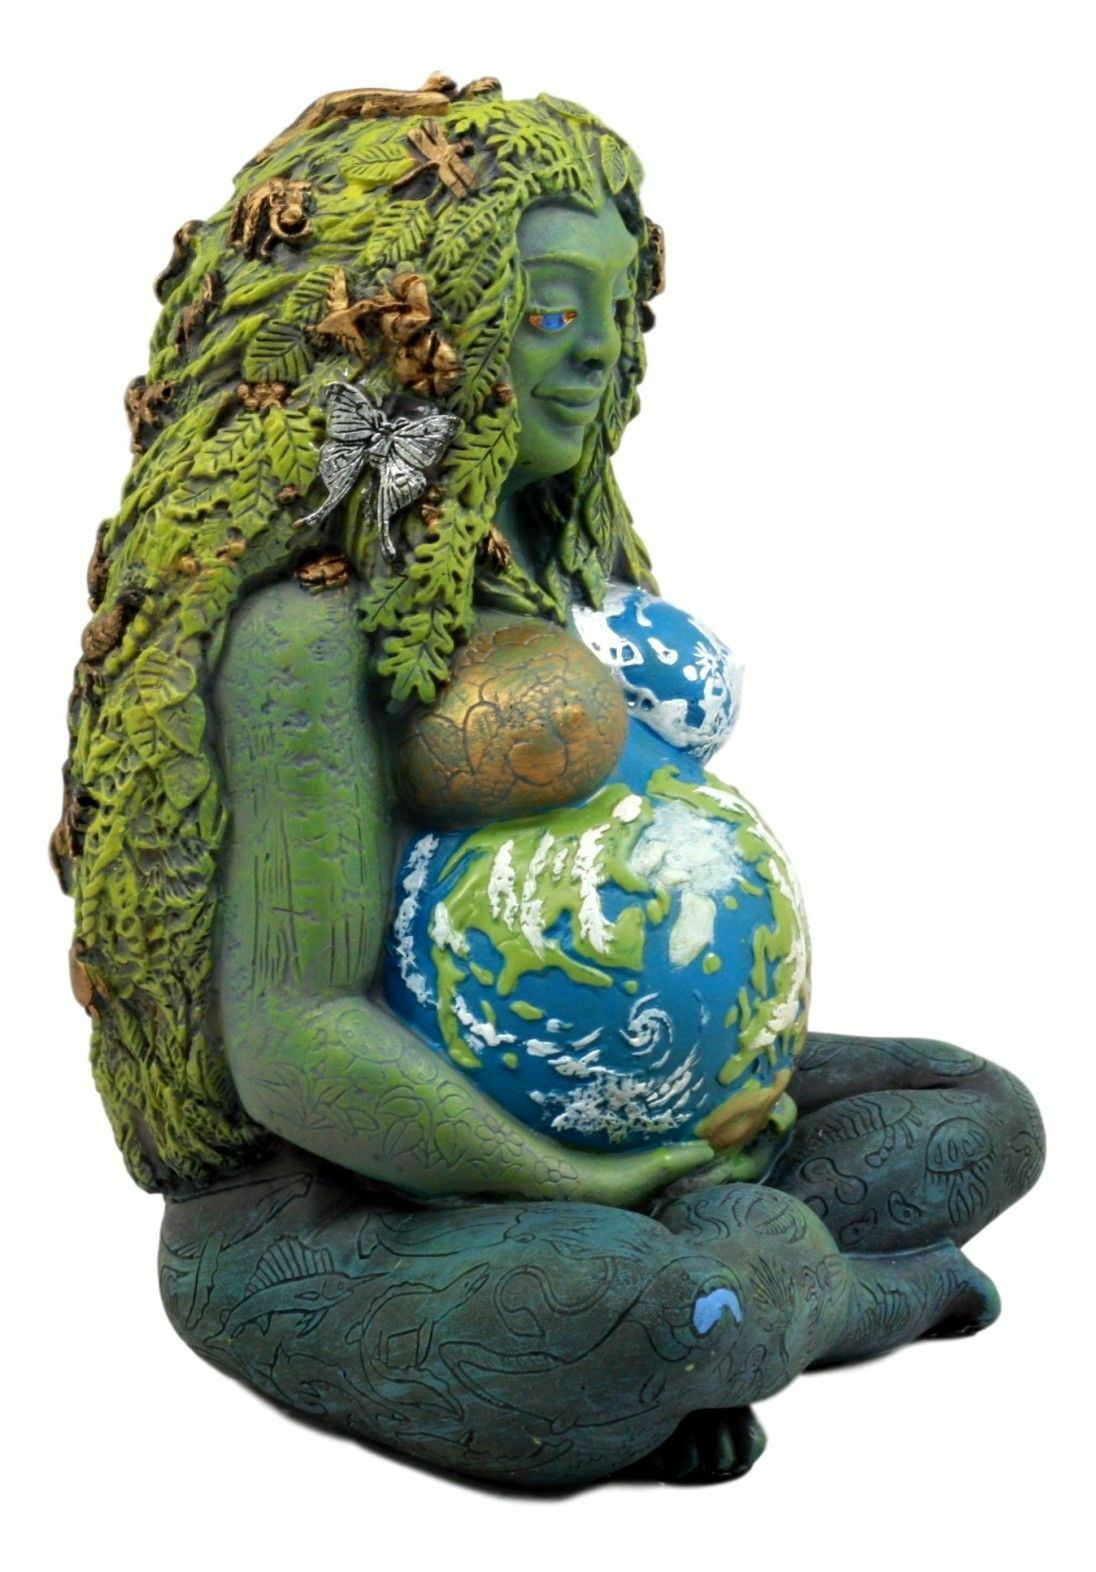 Goddess Figurine Sculpture Fertility Venus Gaia Deity Divine Feminine Mother Talisman Pagan Sacred Altar Meditation Resin